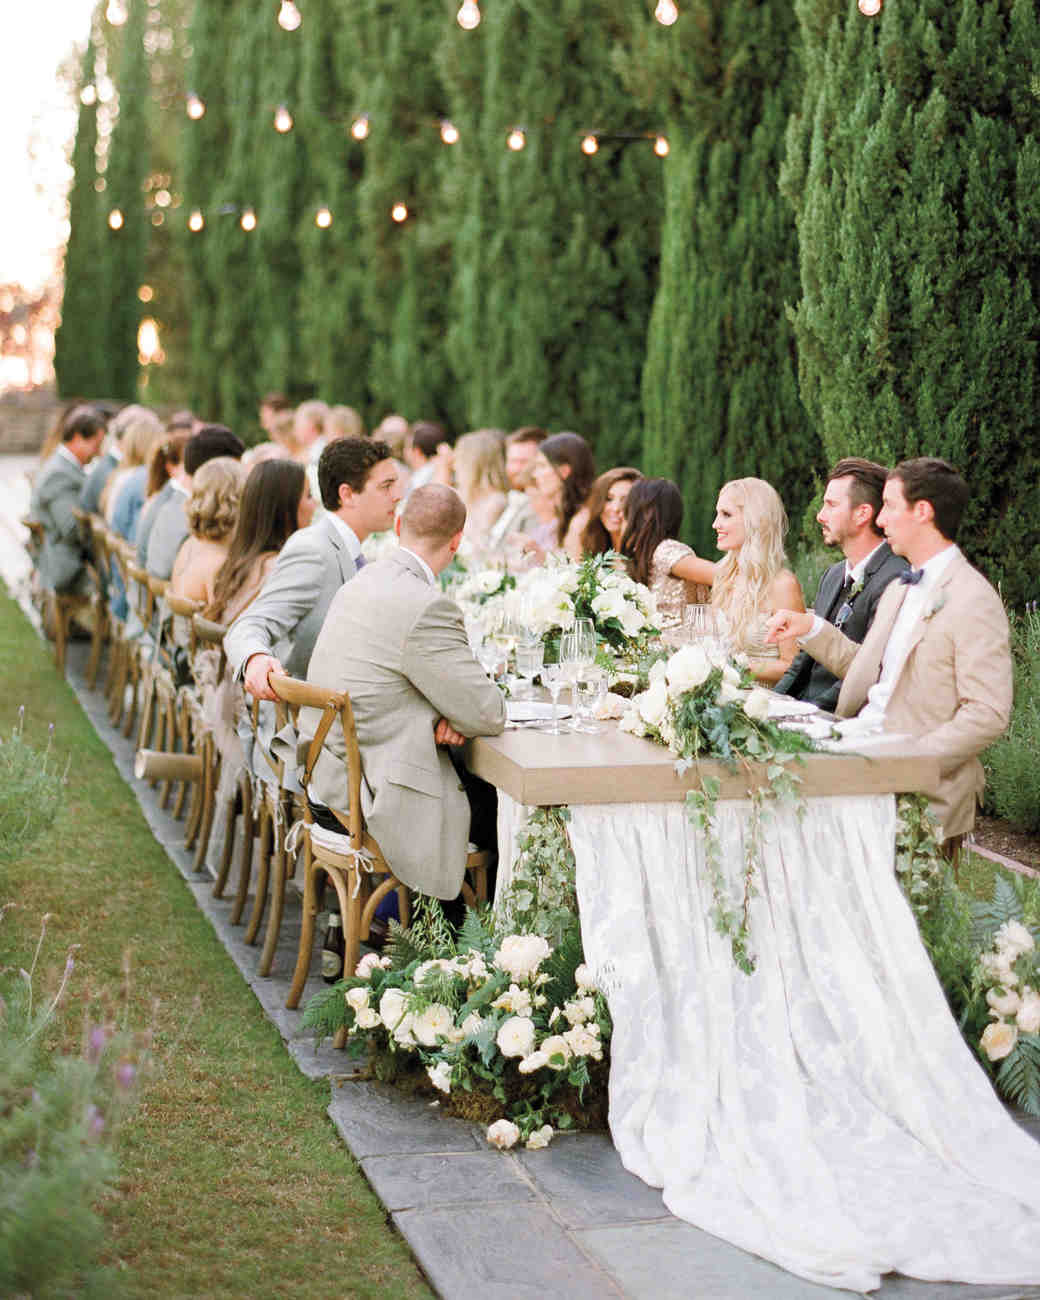 lily-jonathan-wedding-california-66020013-s112482.jpg